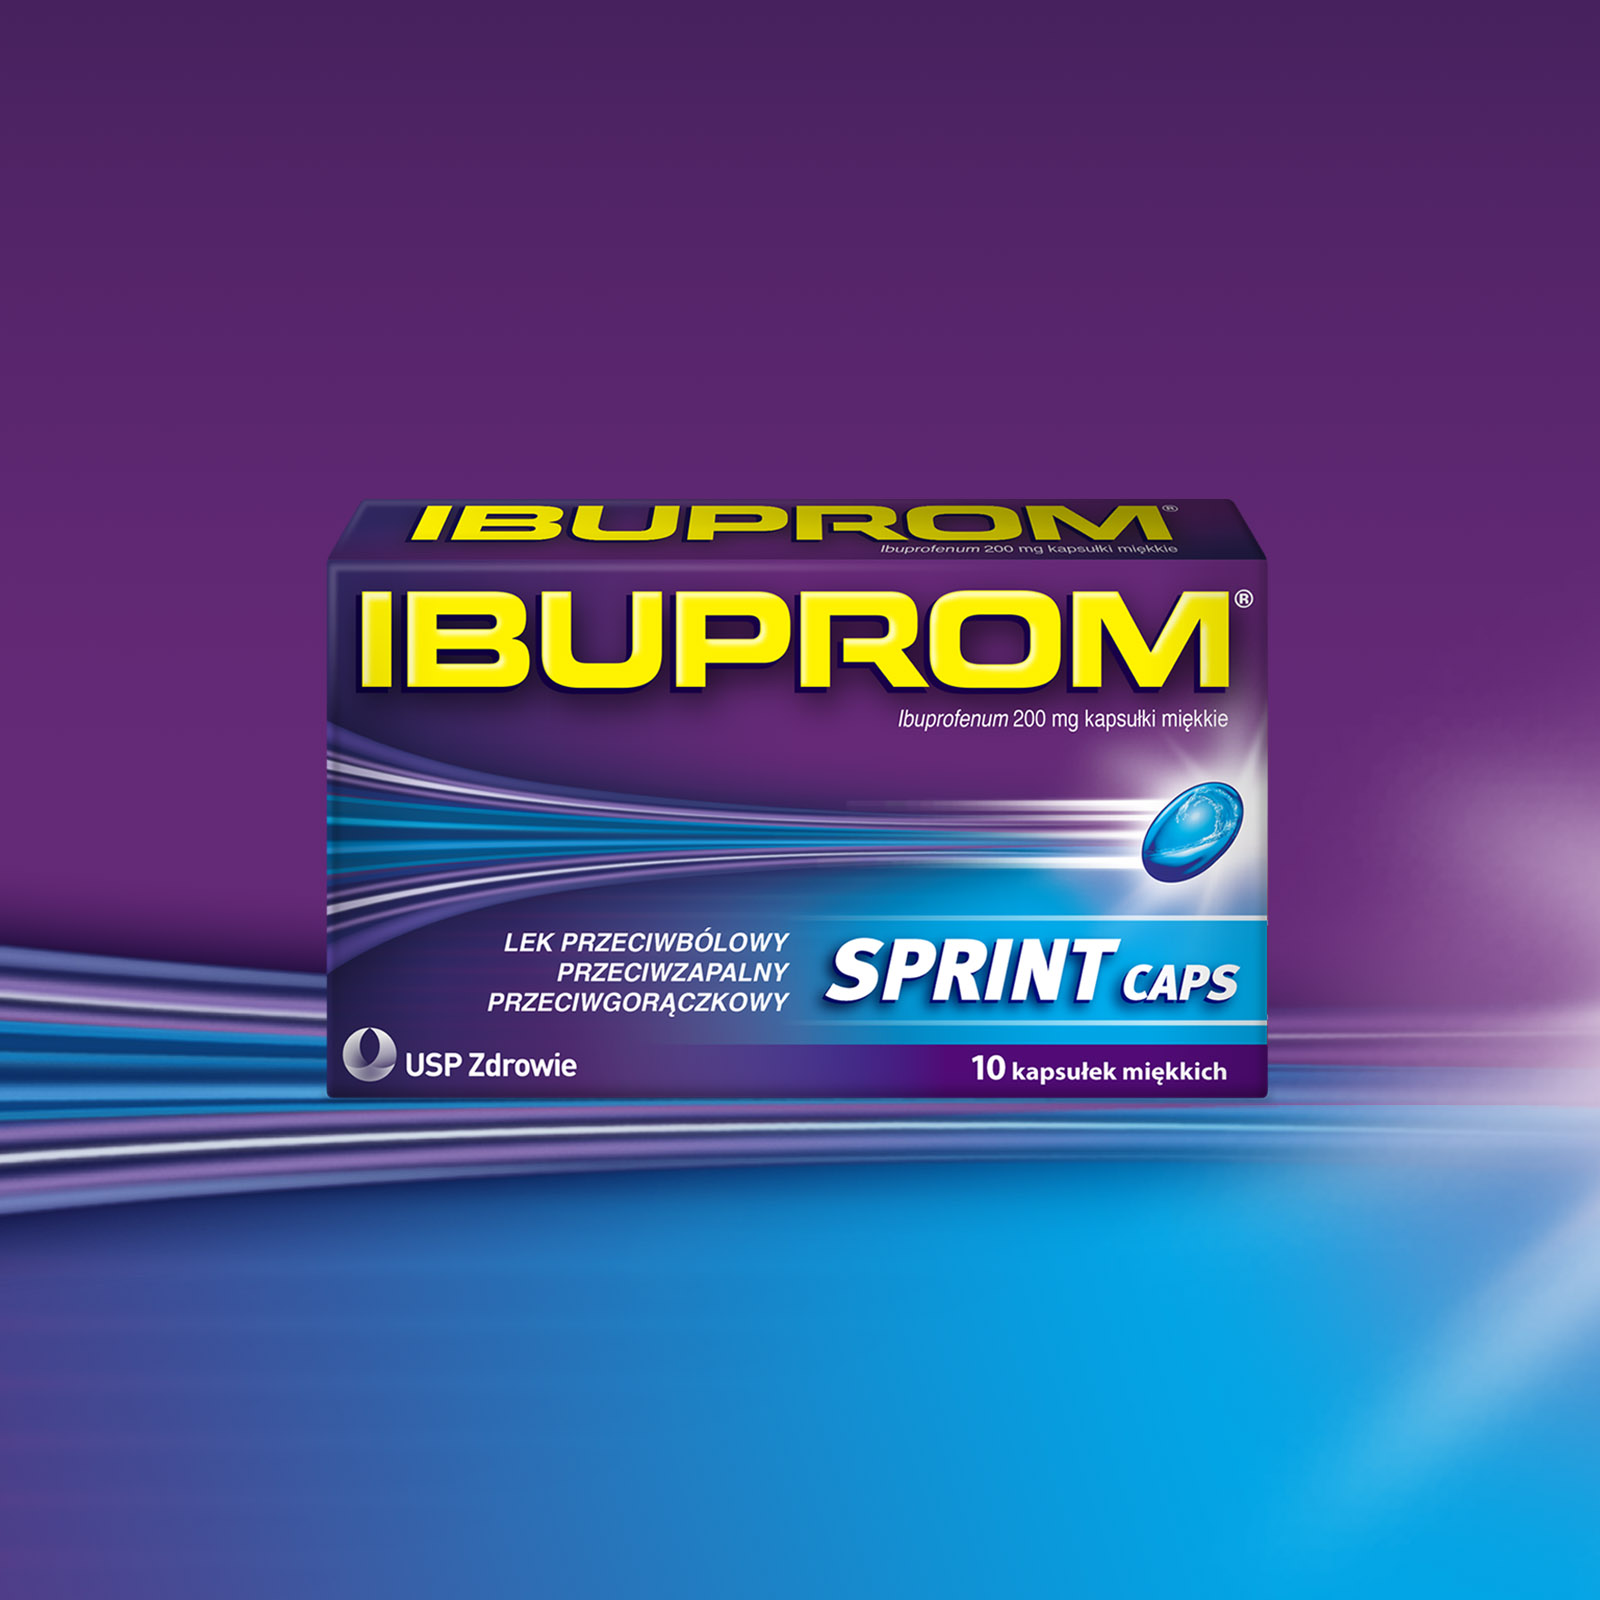 Ibuprom Package Design